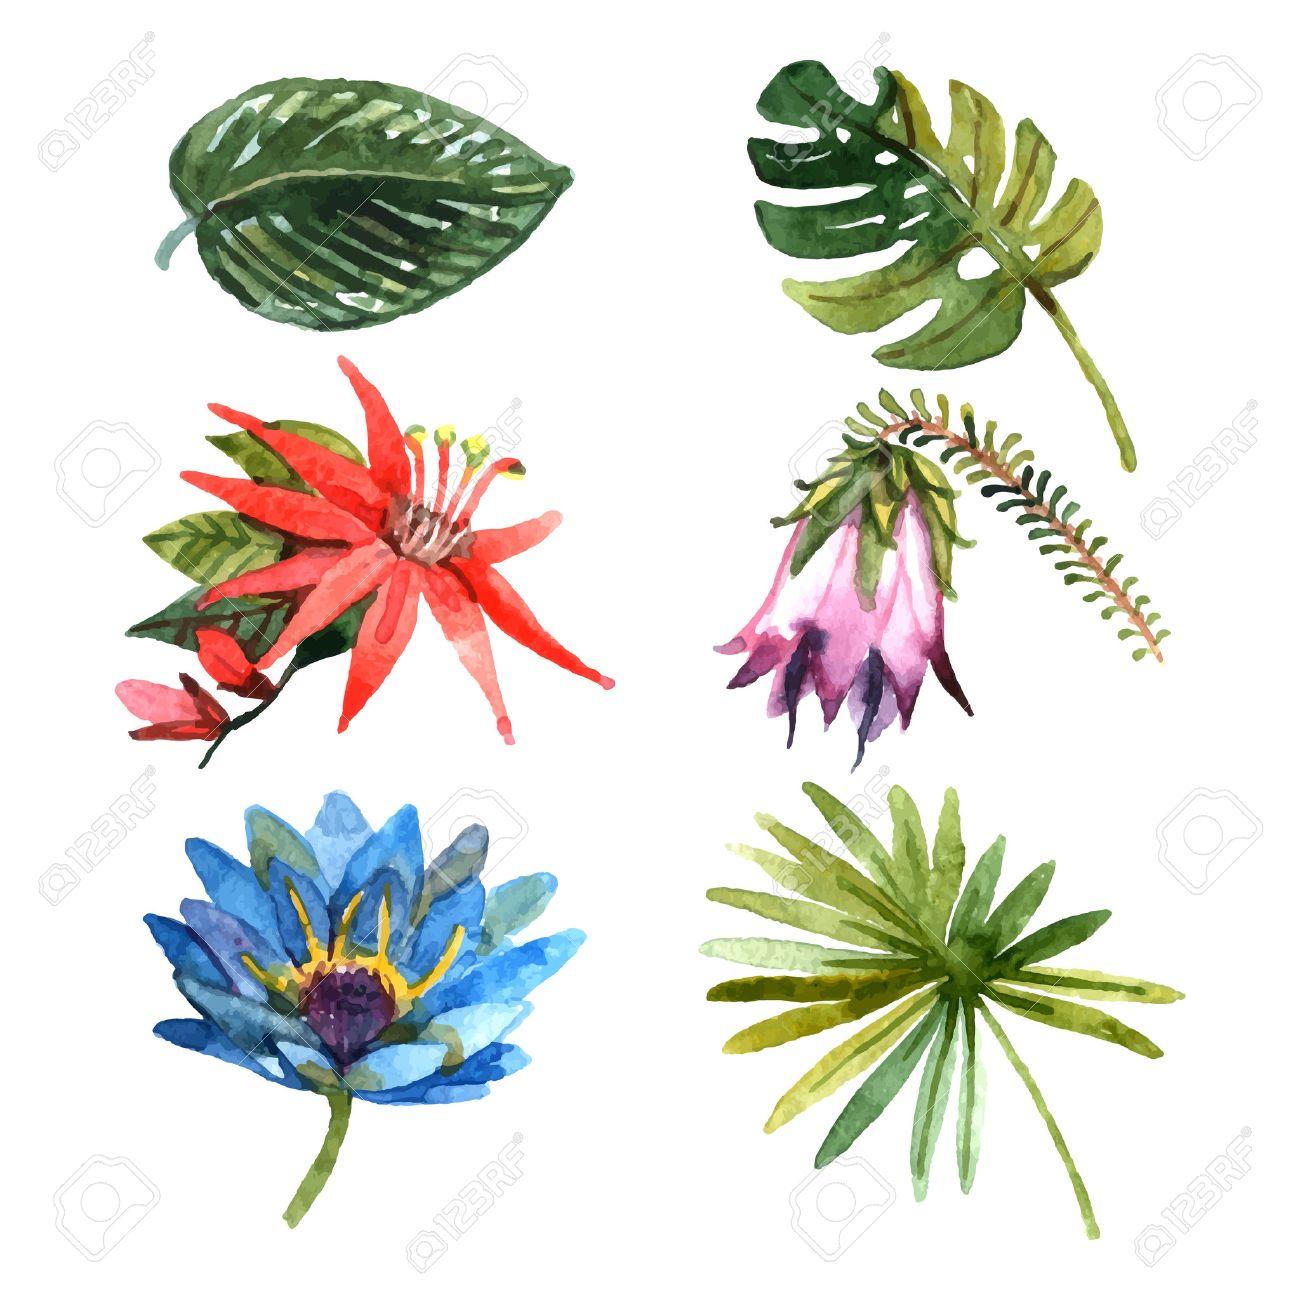 Tropische Pflanzen Im Garten ? Reimplica.info Garten Ideen Tropisch Exotisch Bilder